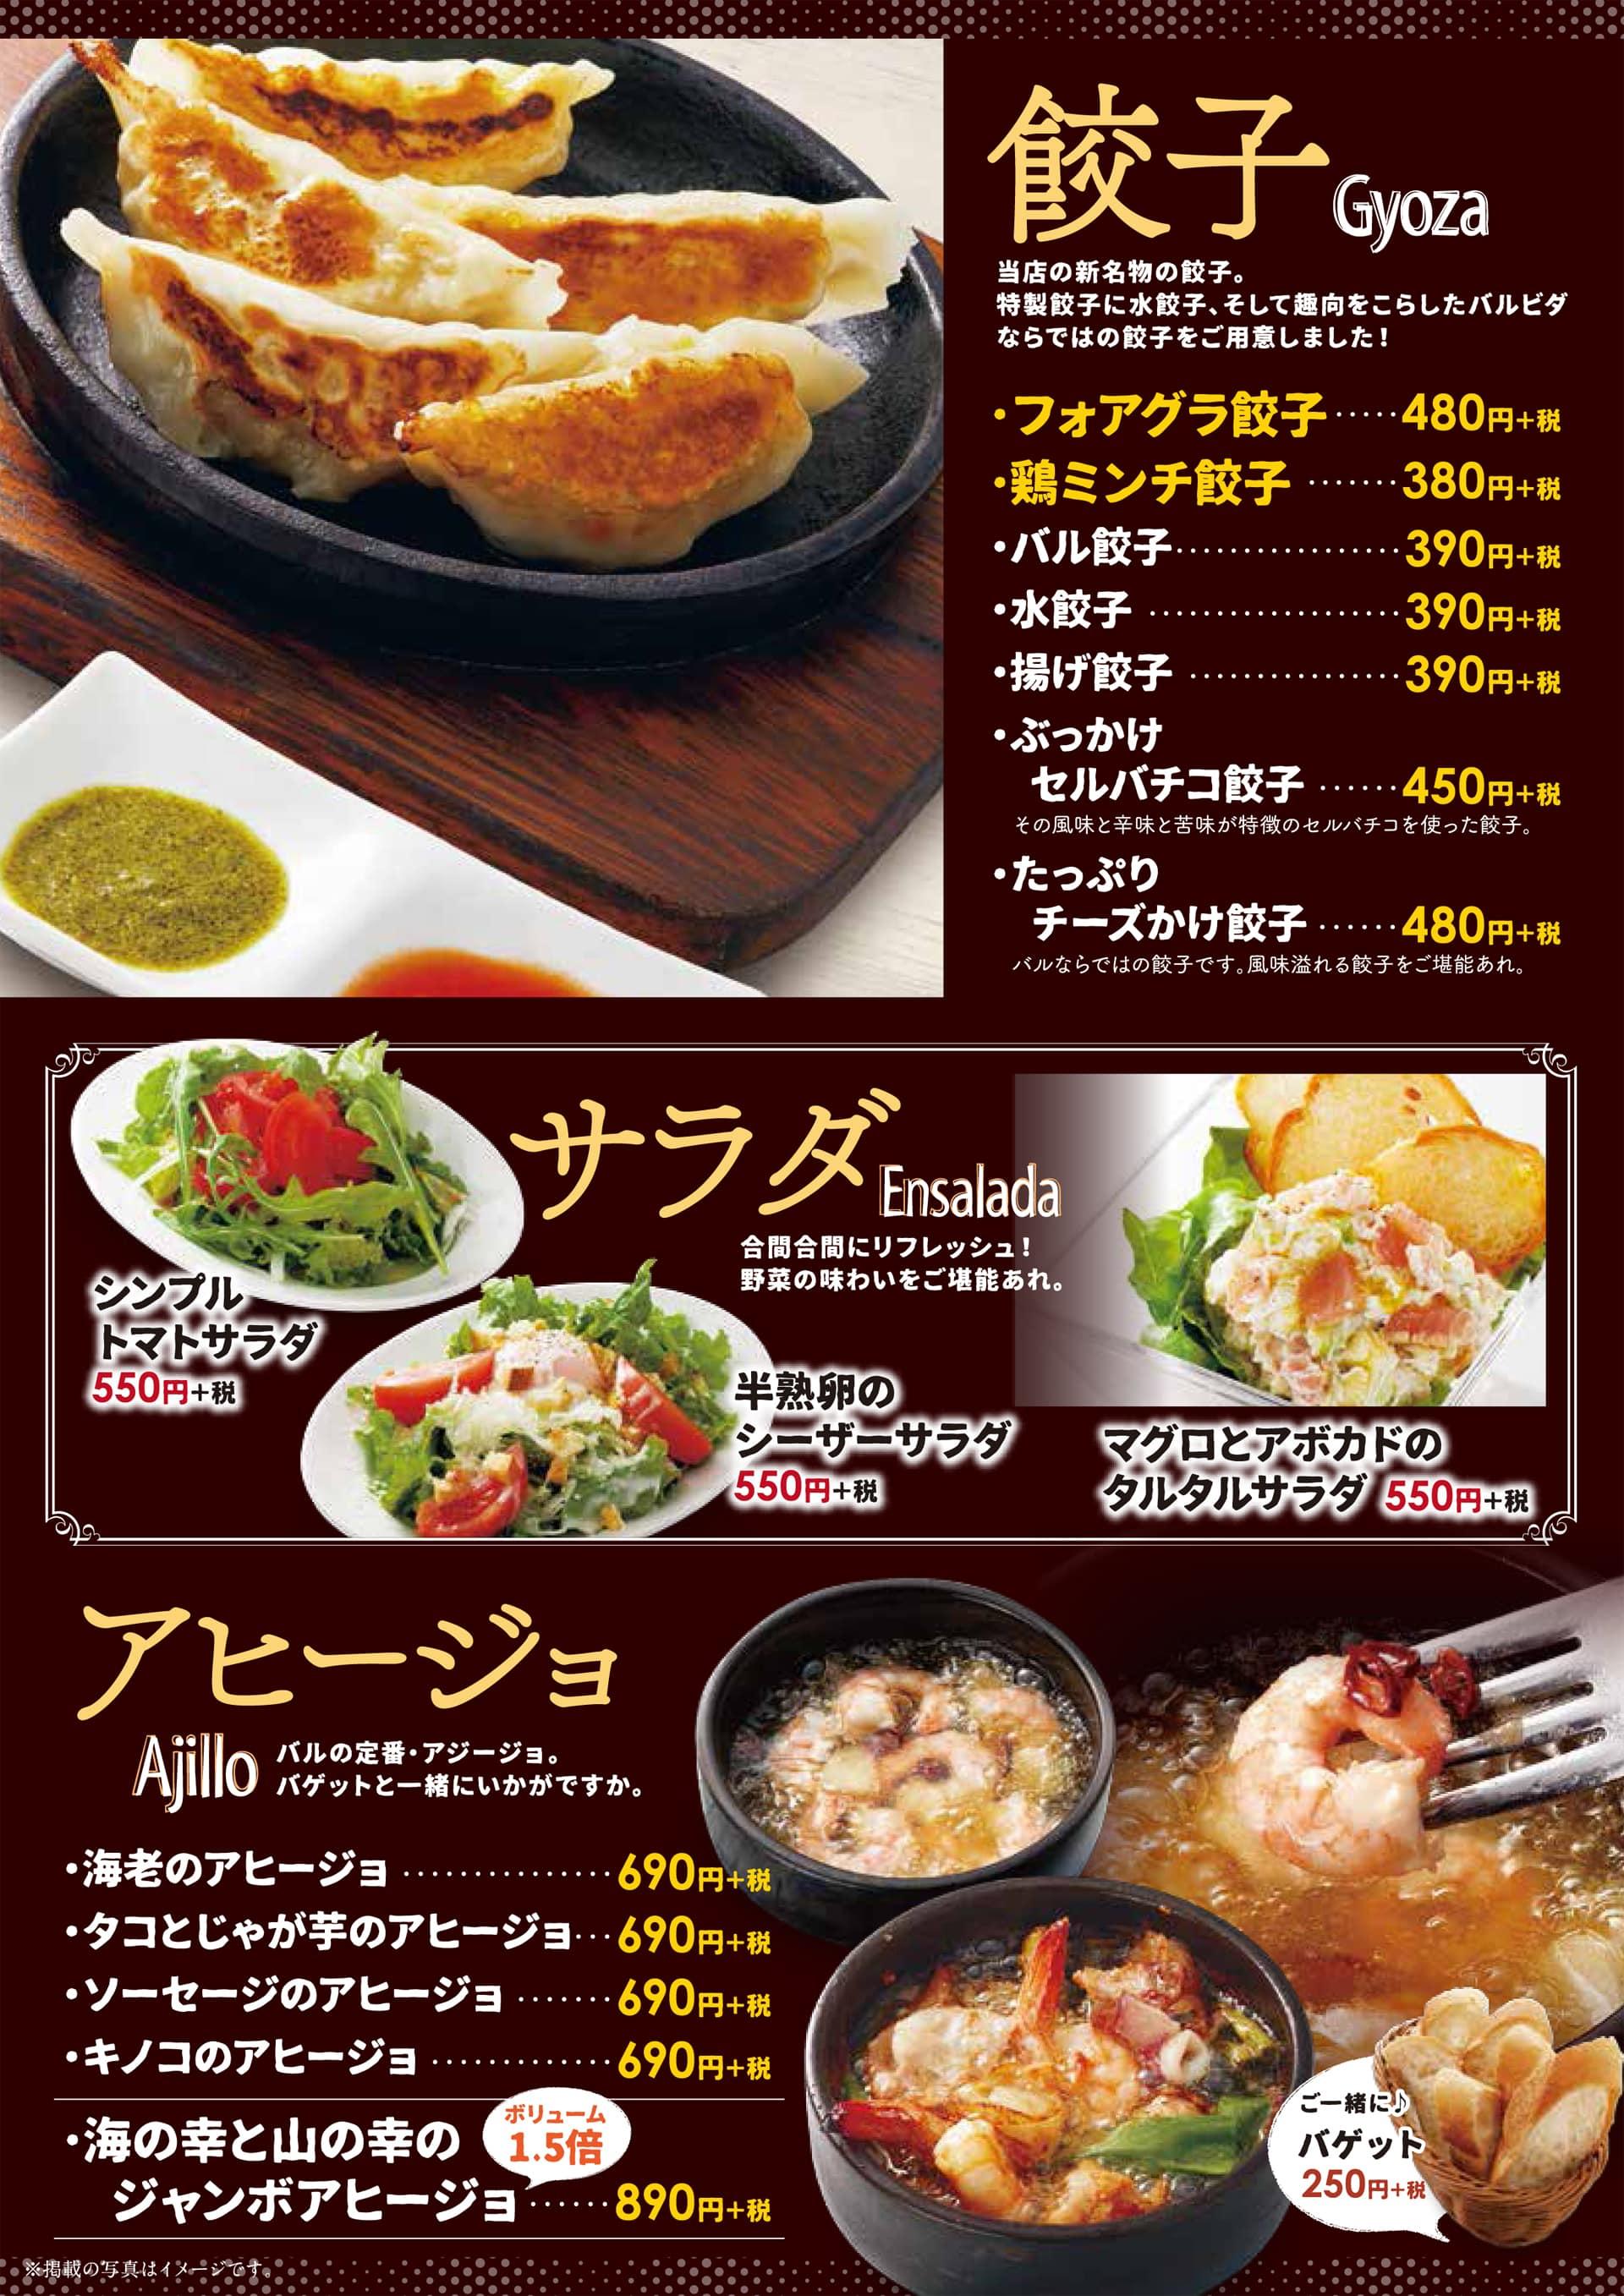 BarVida 餃子・サラダ・アヒージョ